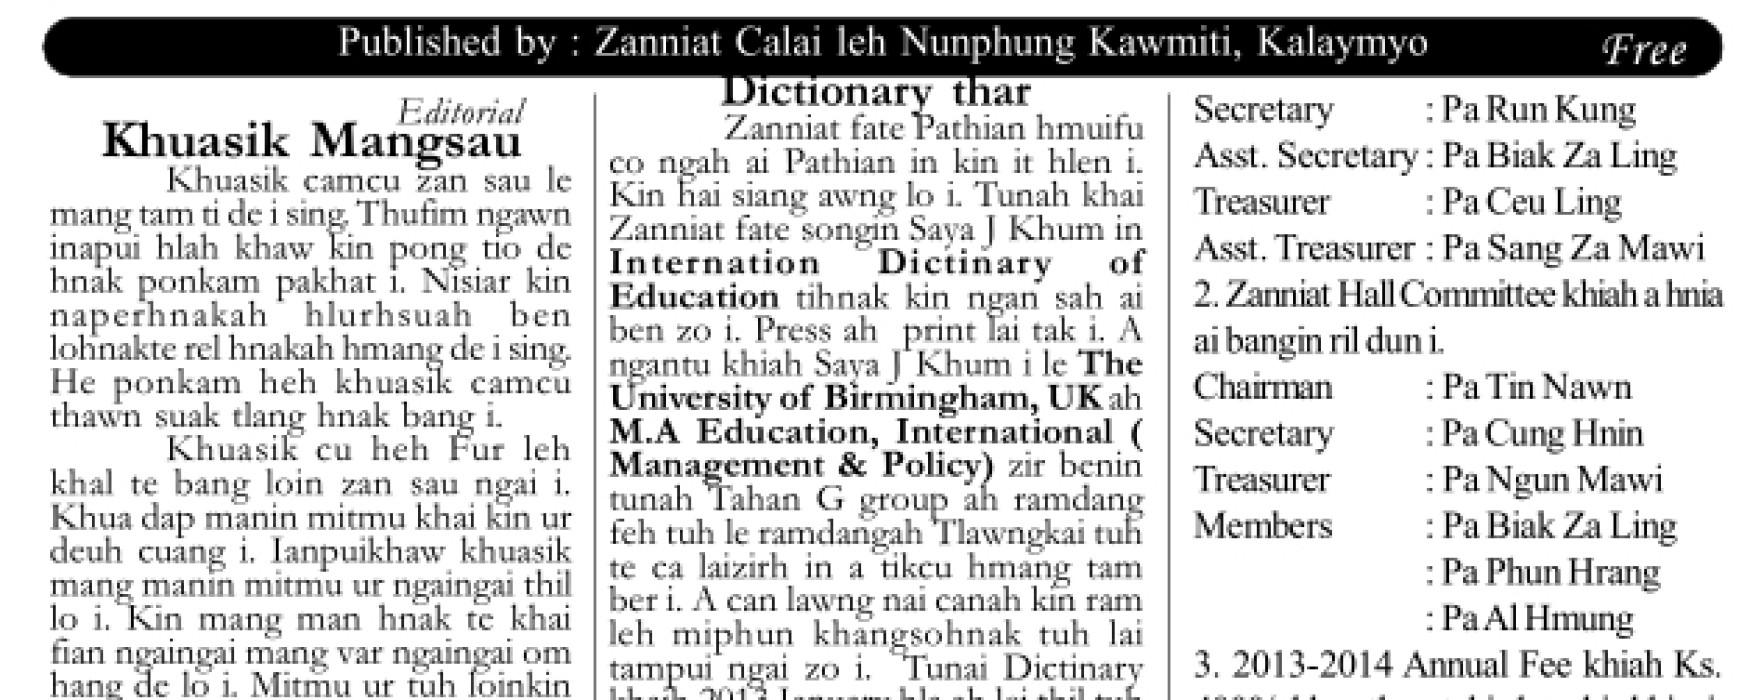 Lairawn Zanniat Auaw: Vol-1 Issue-9 Dec 2012